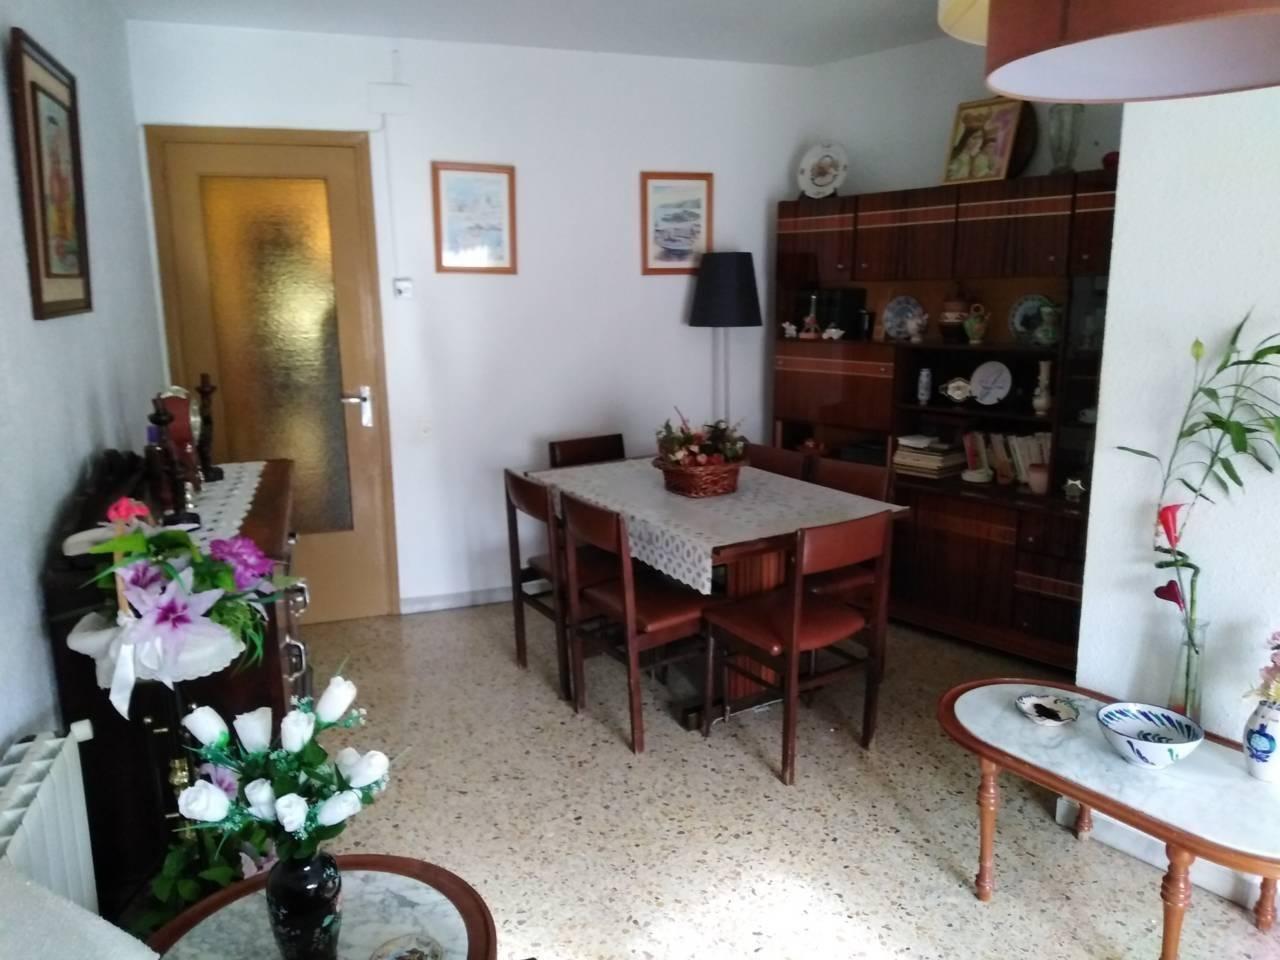 Alquiler Piso  Avenida catalunya, 101. Piso de origen en muy buen estado!!!!!!!!!!!! superf. 74 m²,  3